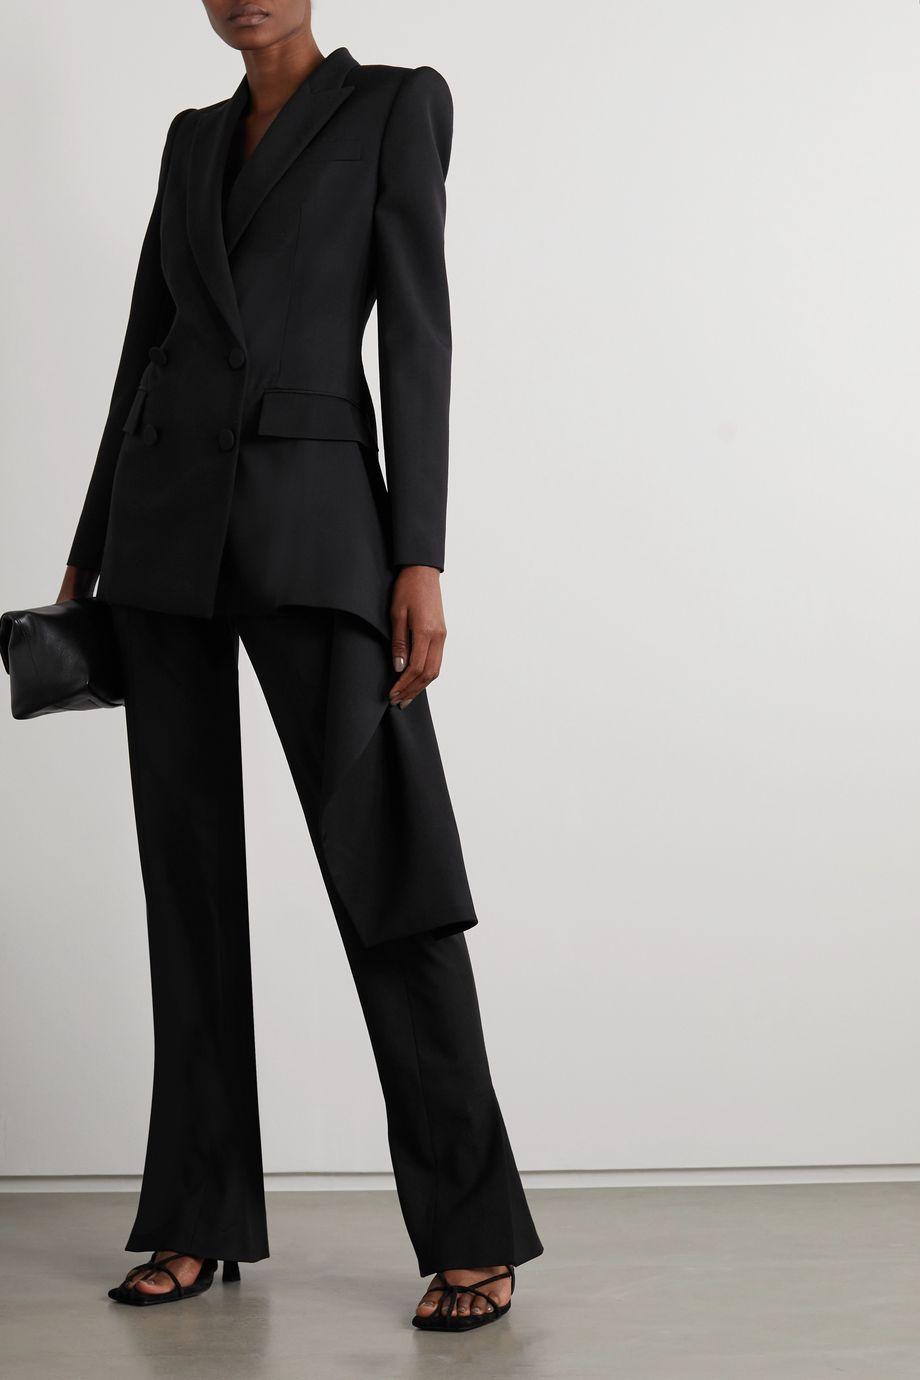 Alexander McQueen 不对称垂坠粒纹羊毛西装式外套